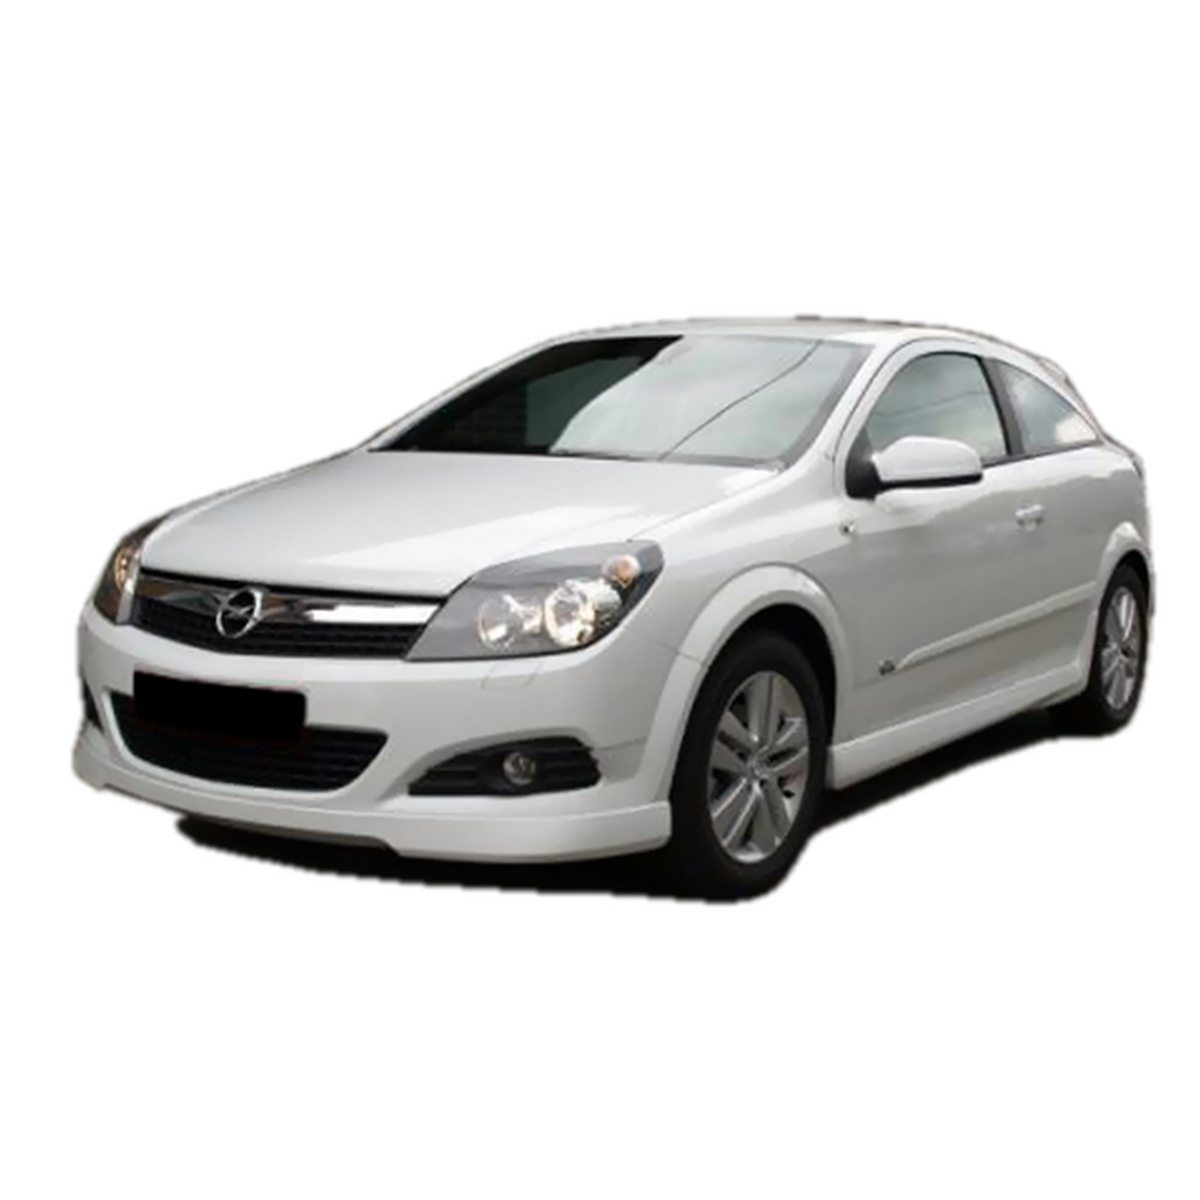 Opel-Astra-H-OPC-Spoiler-Frt-SPU0802